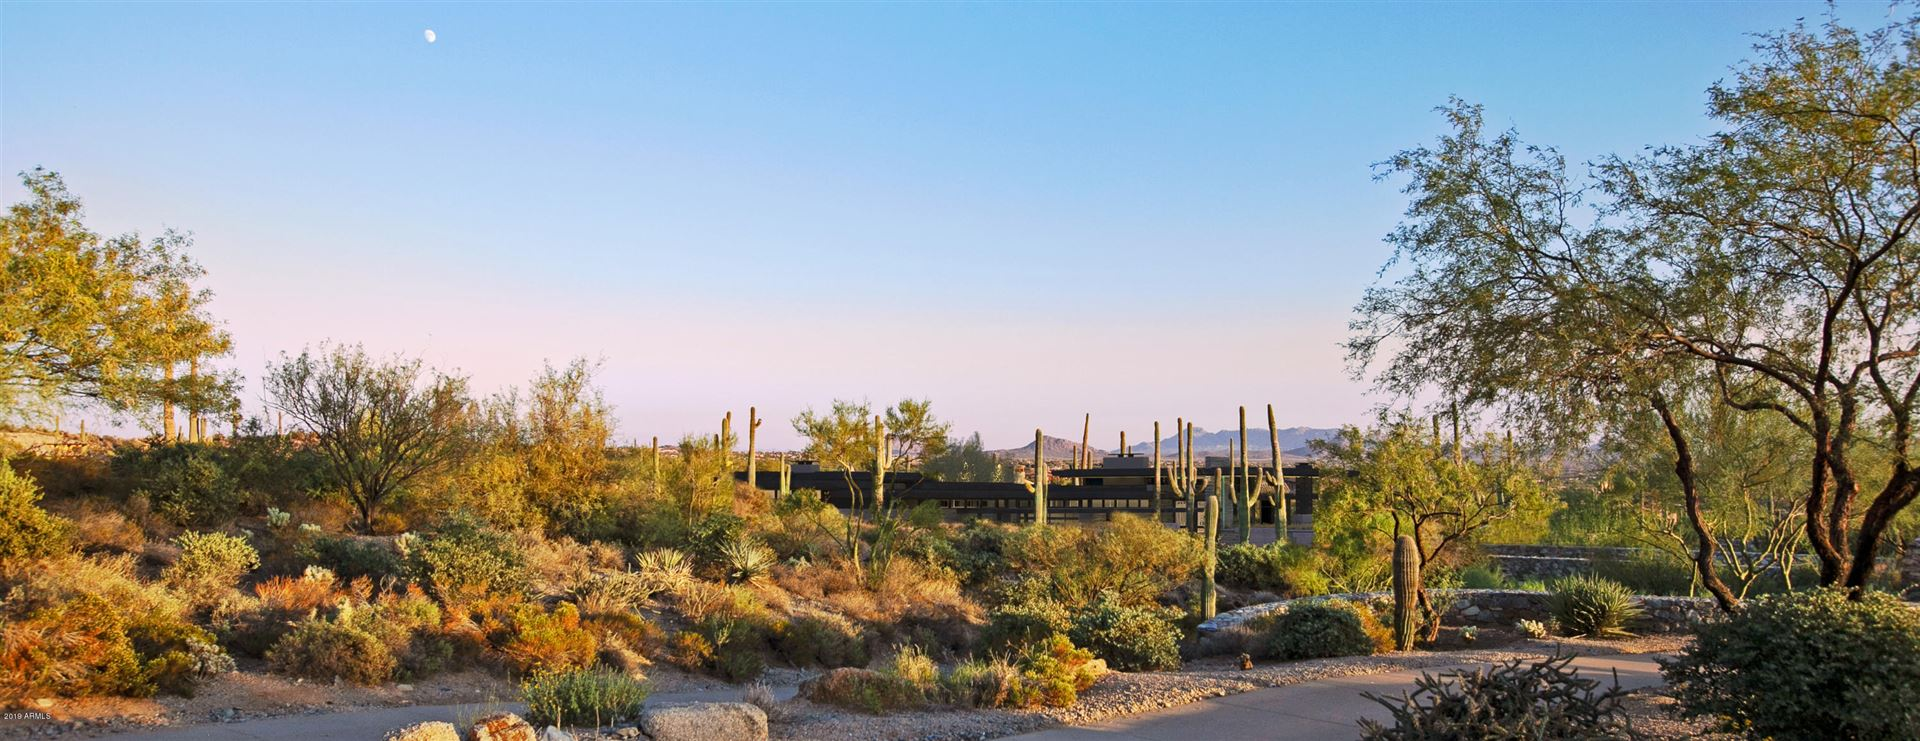 Photo of 41927 N SAGUARO FOREST Drive, Scottsdale, AZ 85262 (MLS # 6012791)